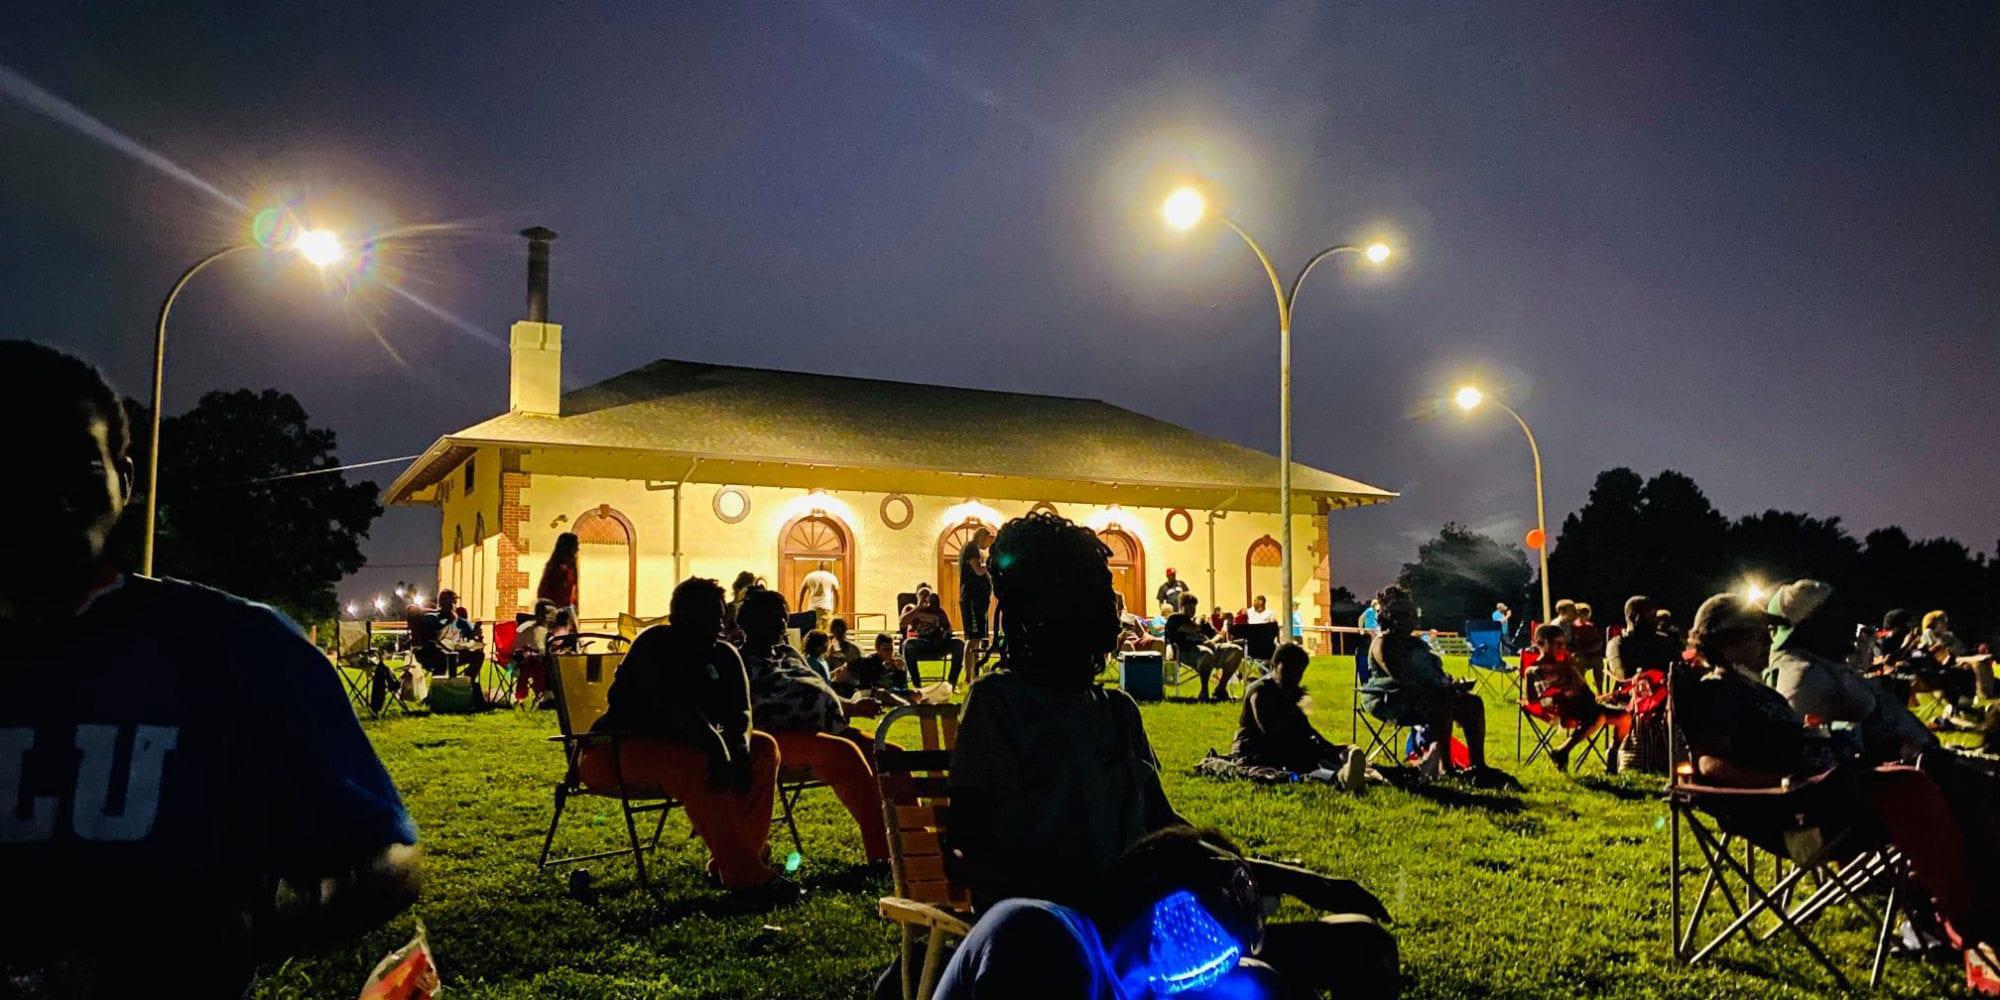 July 2020 Dutchtown Movie Night in Marquette Park. Photo by Ben Robinson of Billionaire Royalties.